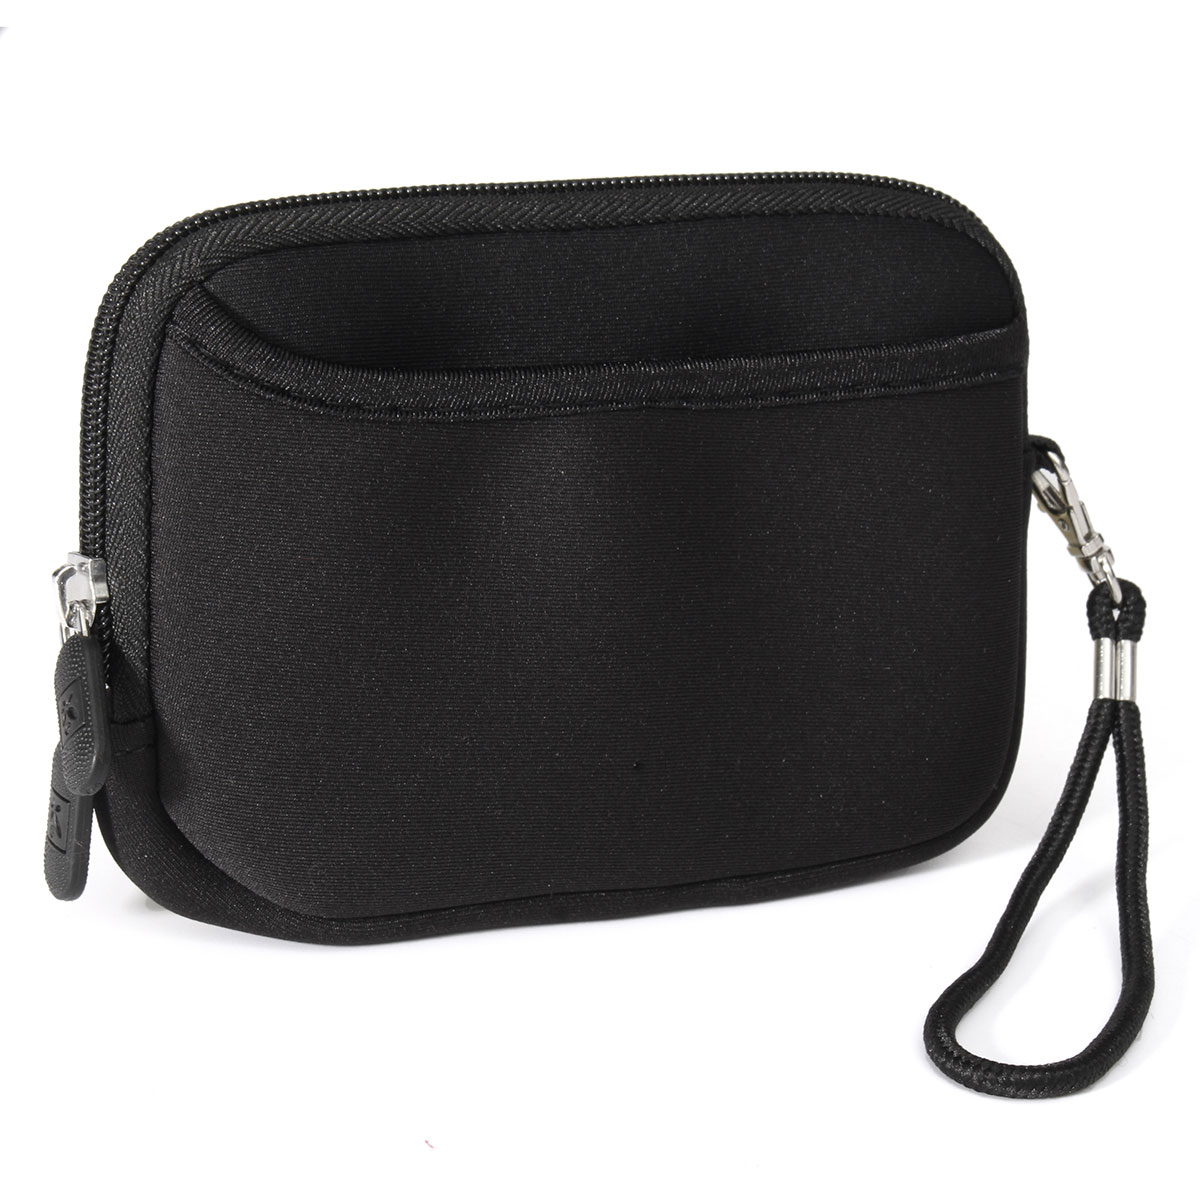 Black 5 inch In Car Sat Nav font b GPS b font Carry Case Cover Holder